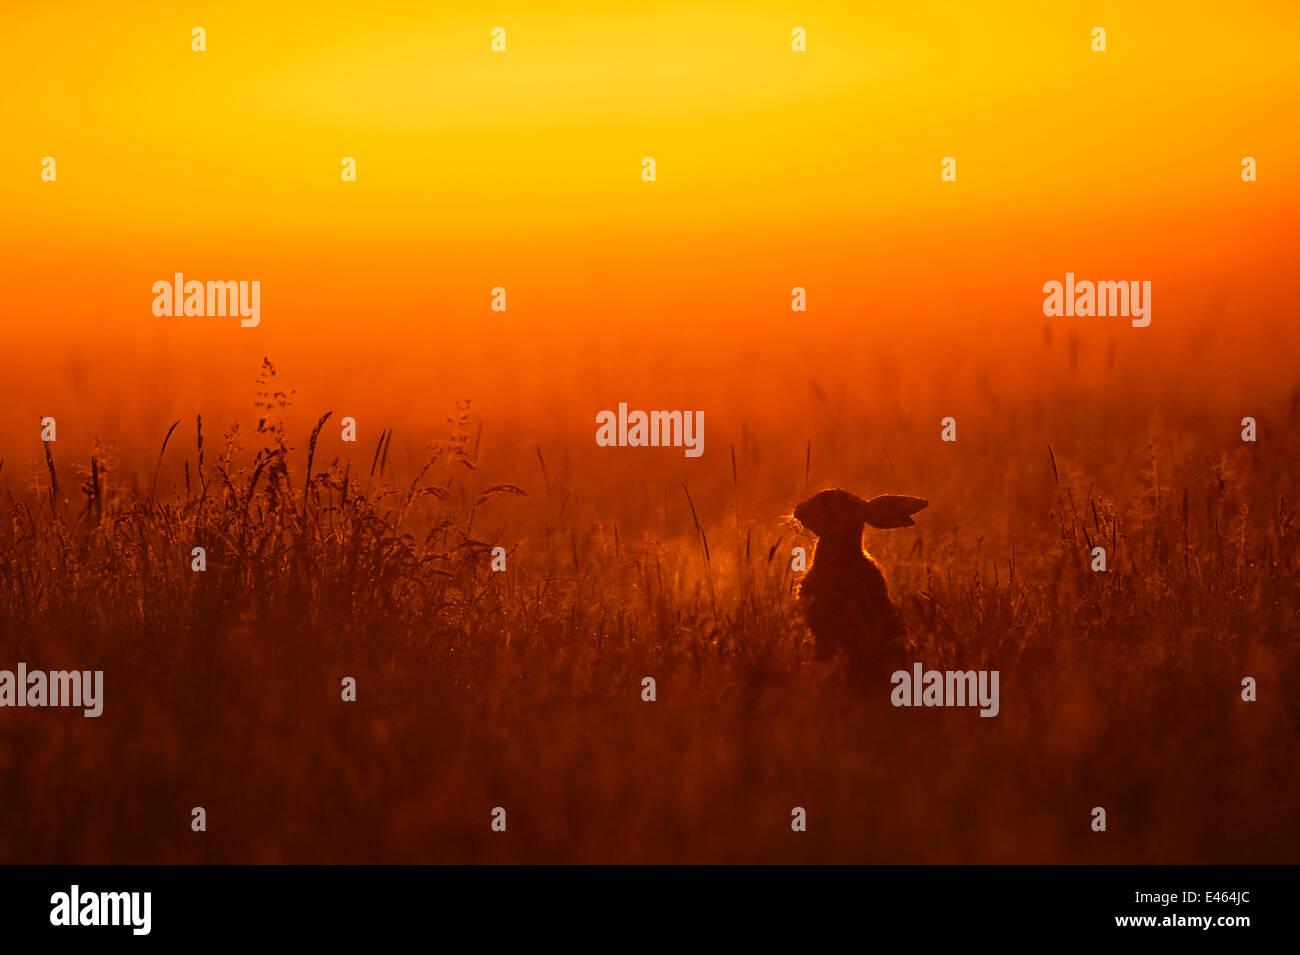 European hare (Lepus europaeus) silhouetted sitting in field at sunrise, UK, June - Stock Image